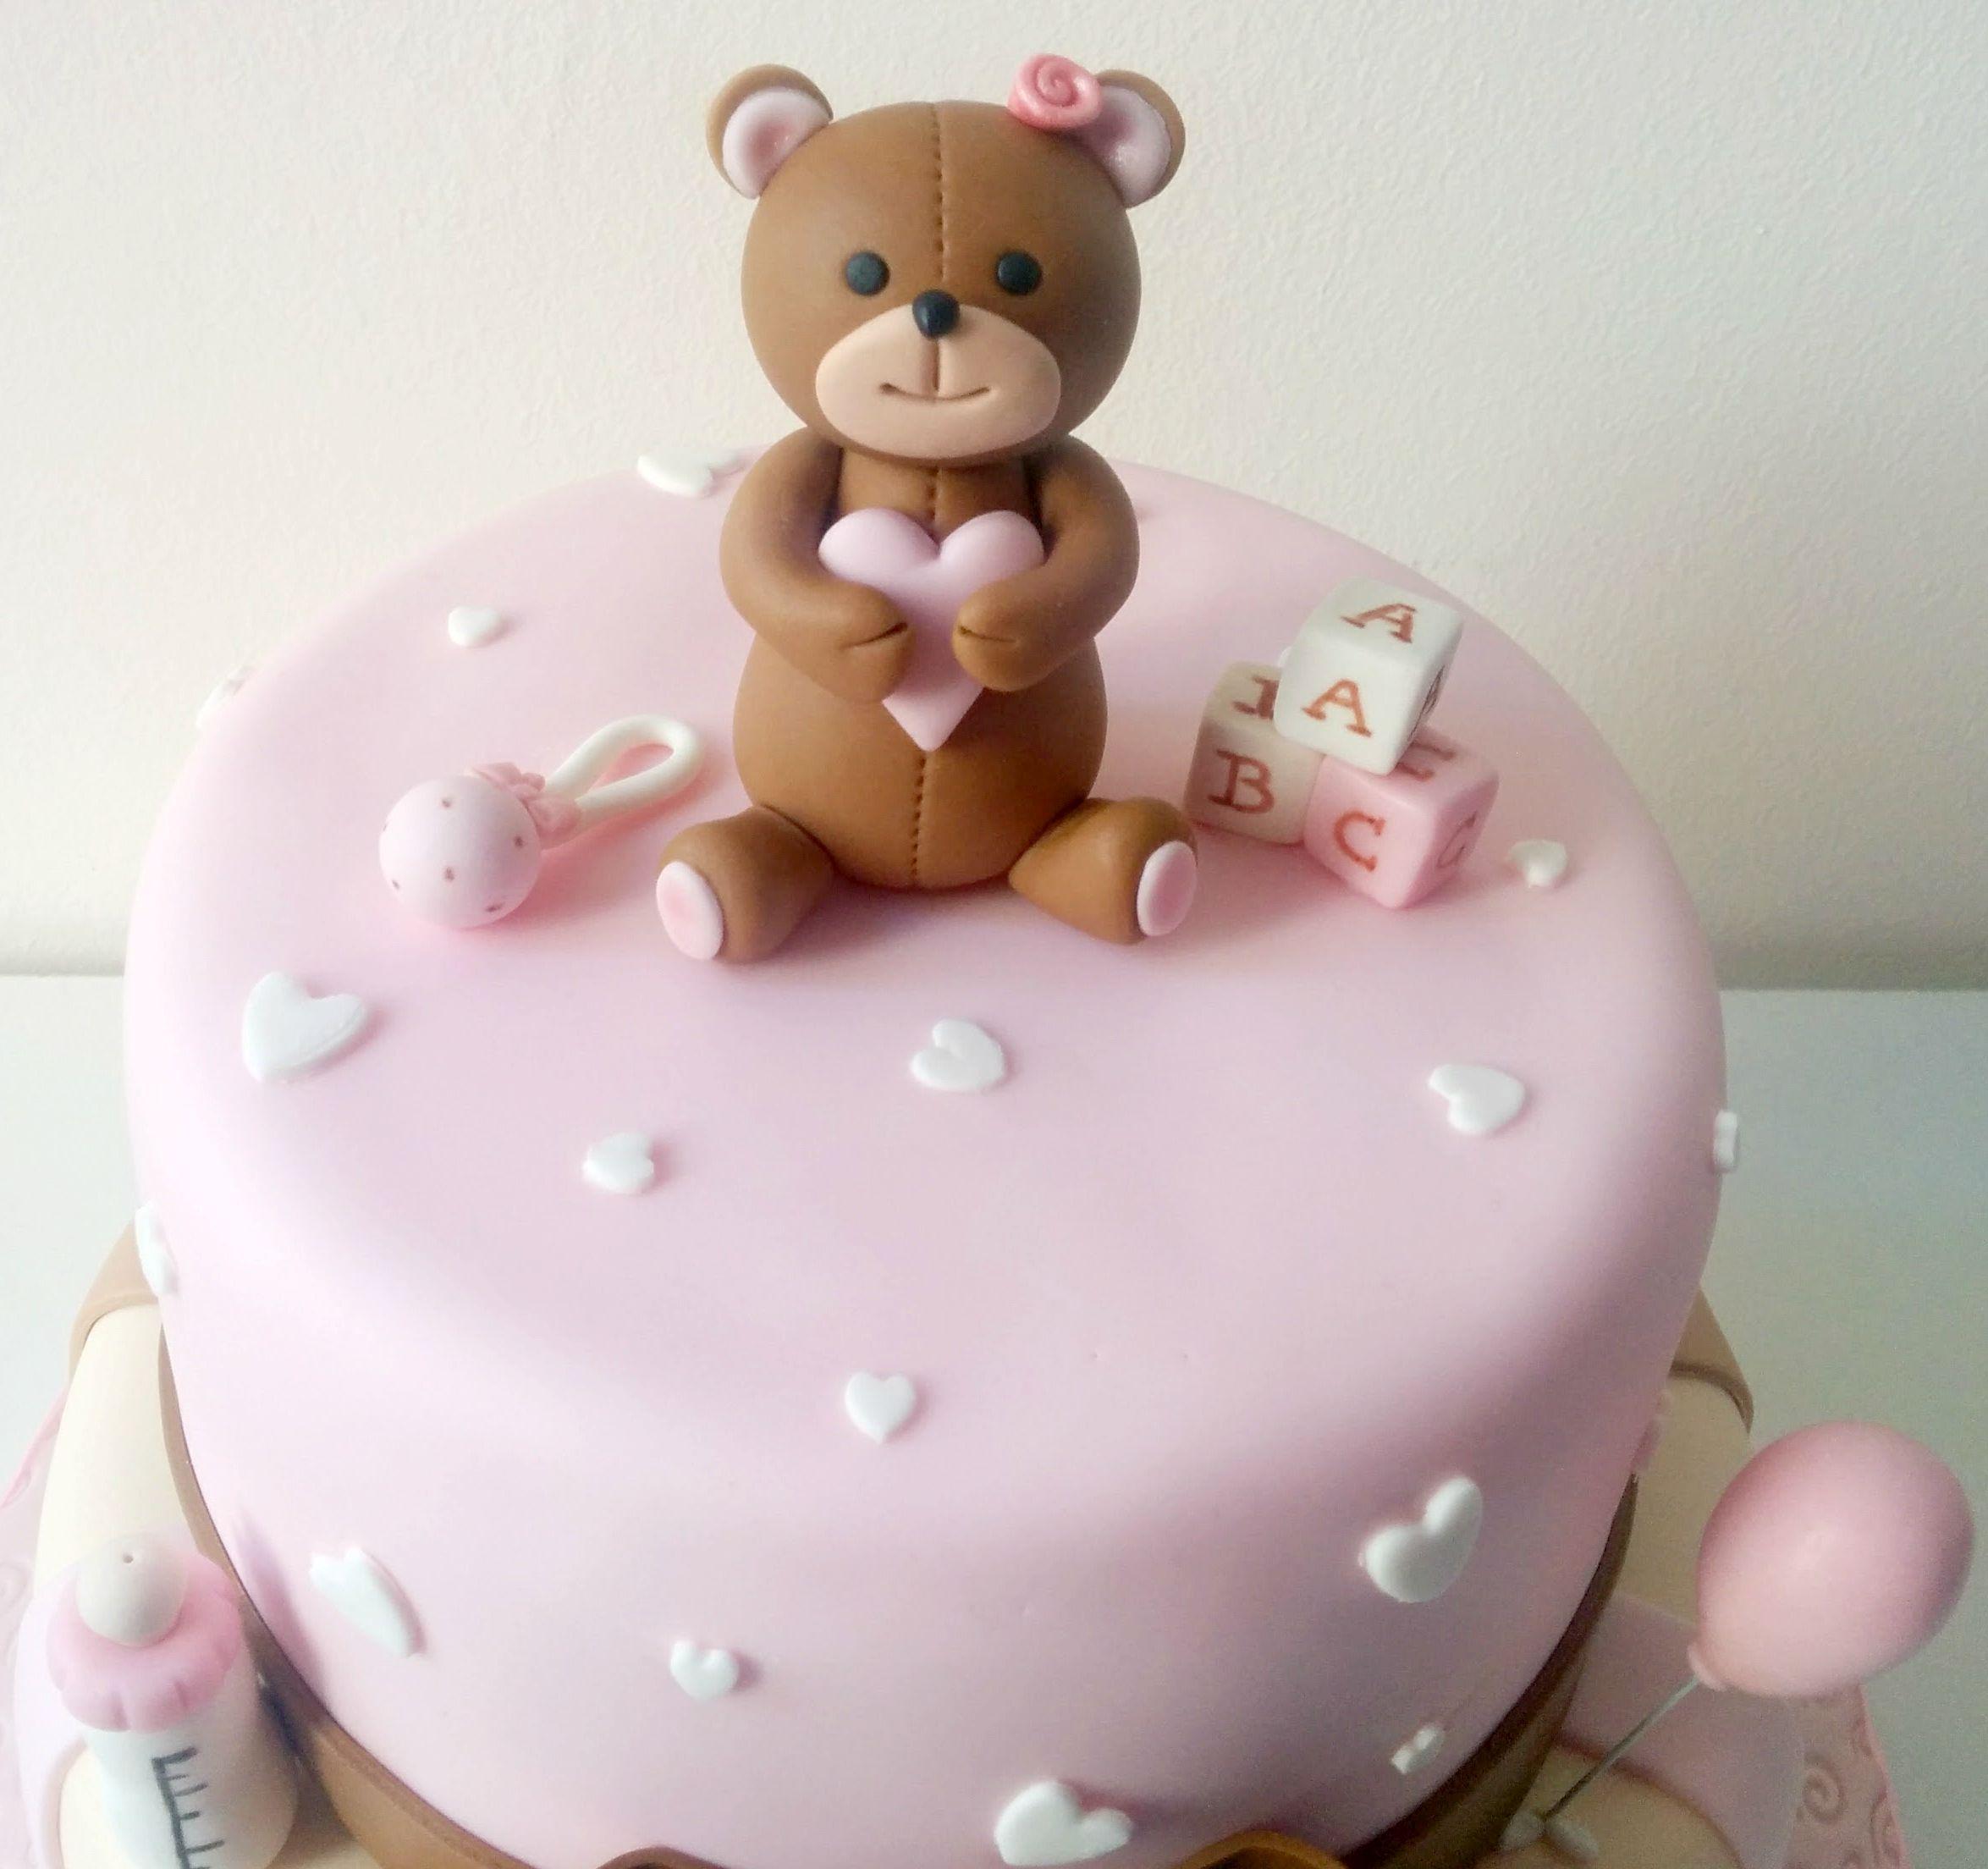 Torta battesimo orsetto battesimo baptism cake torta bimba girl